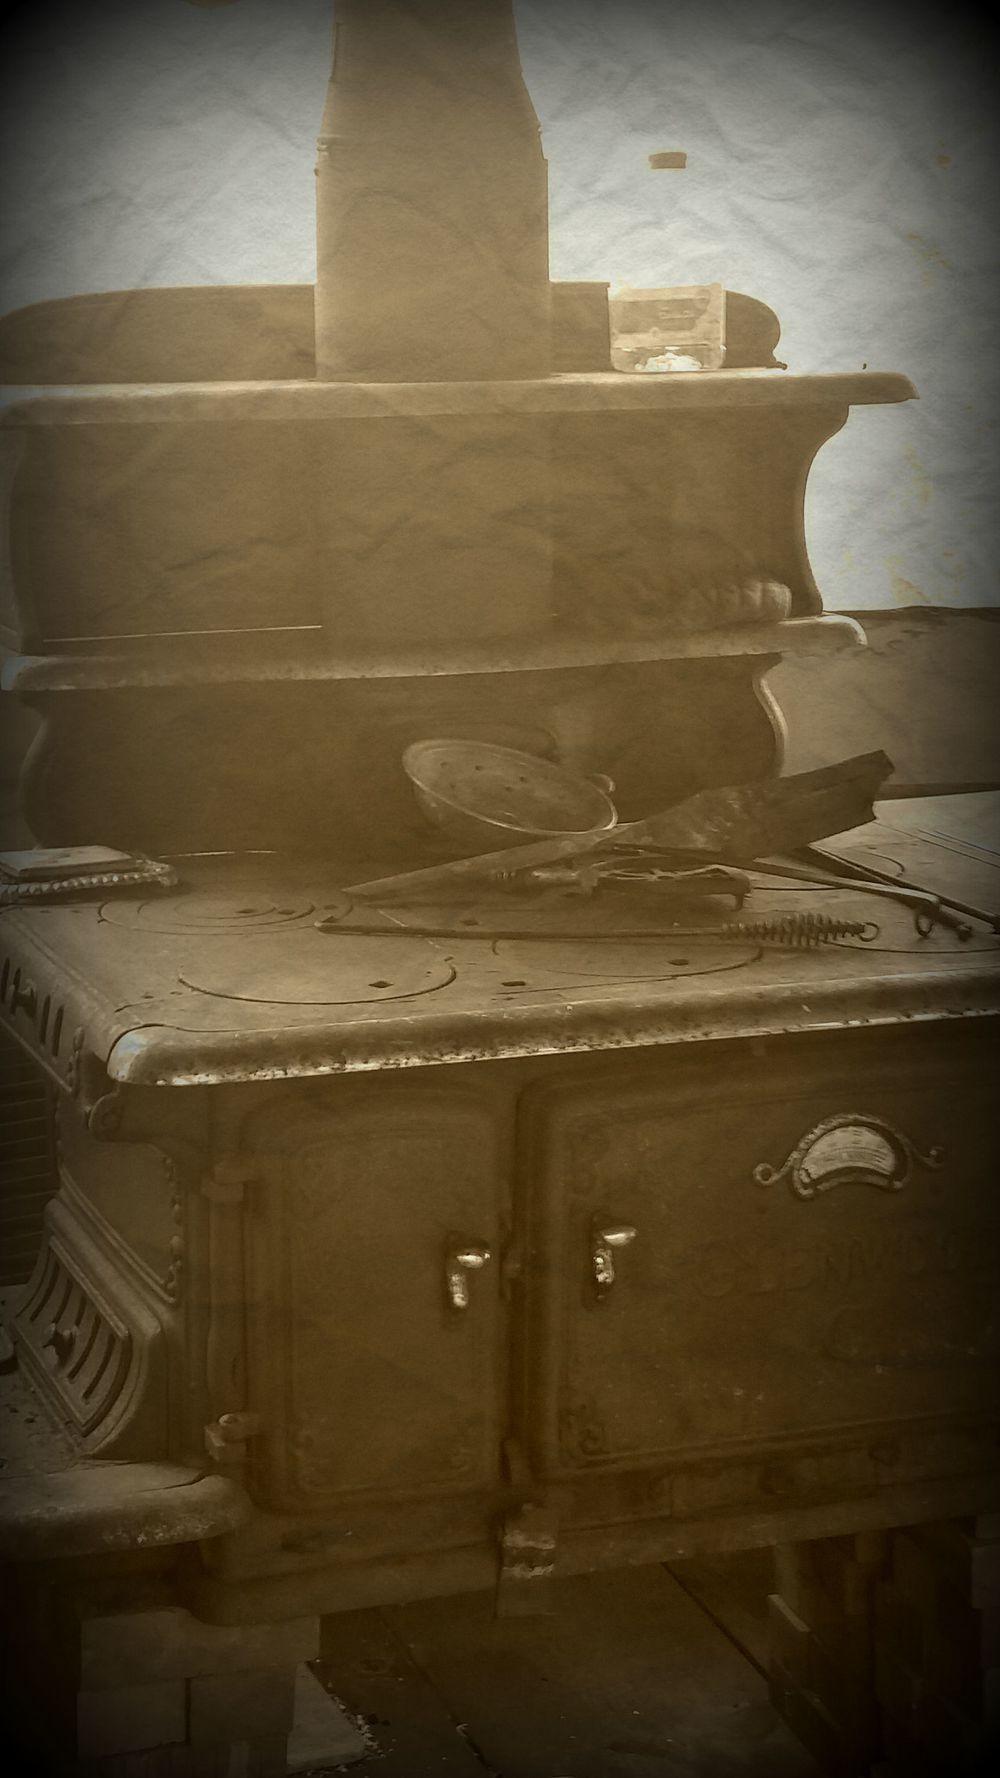 old stove pic.jpg